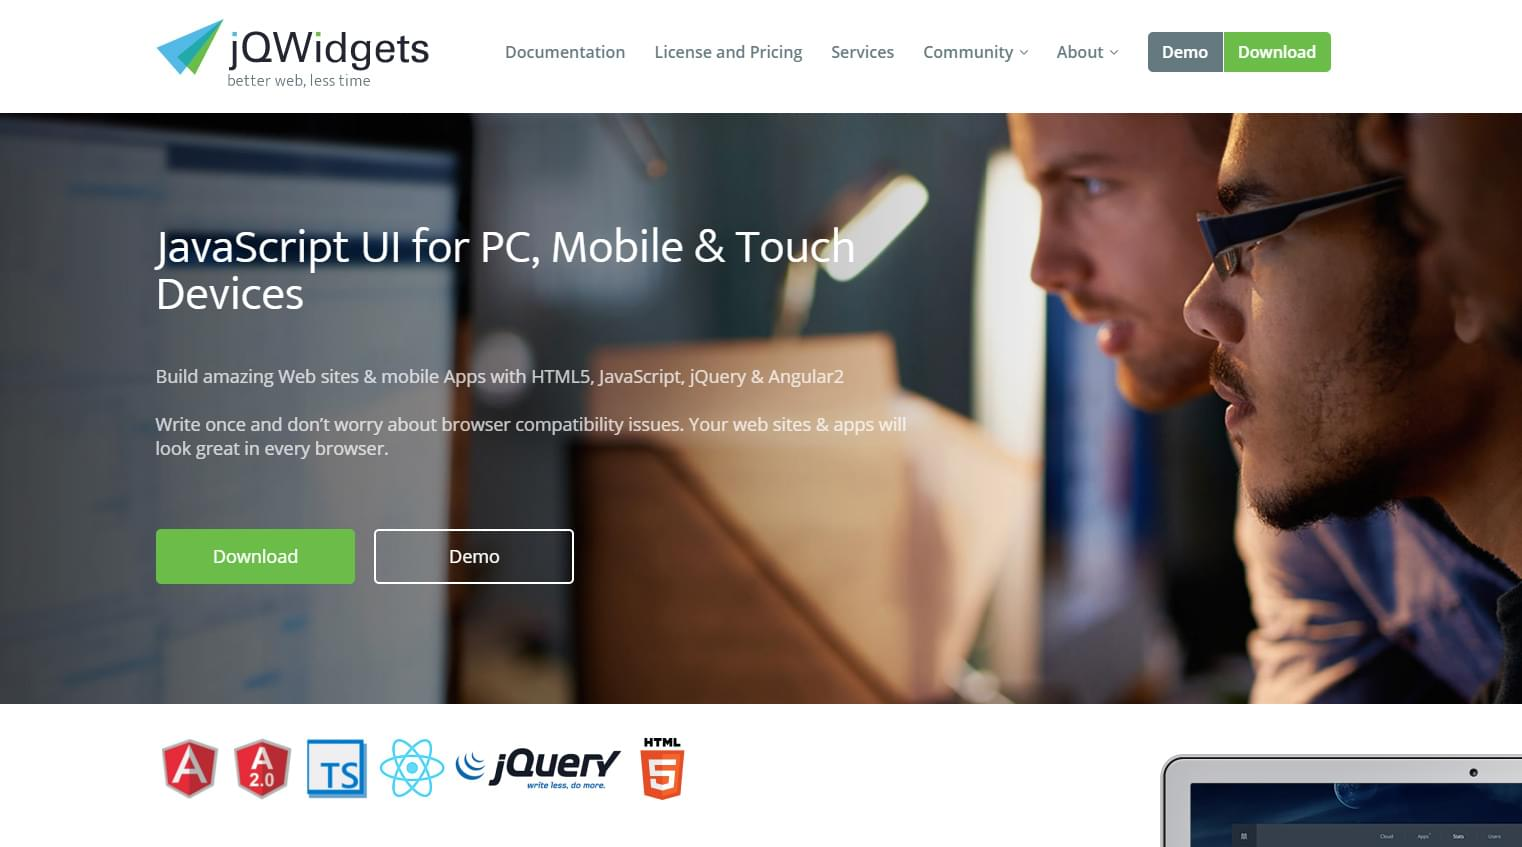 JQwidgets homepage intro image